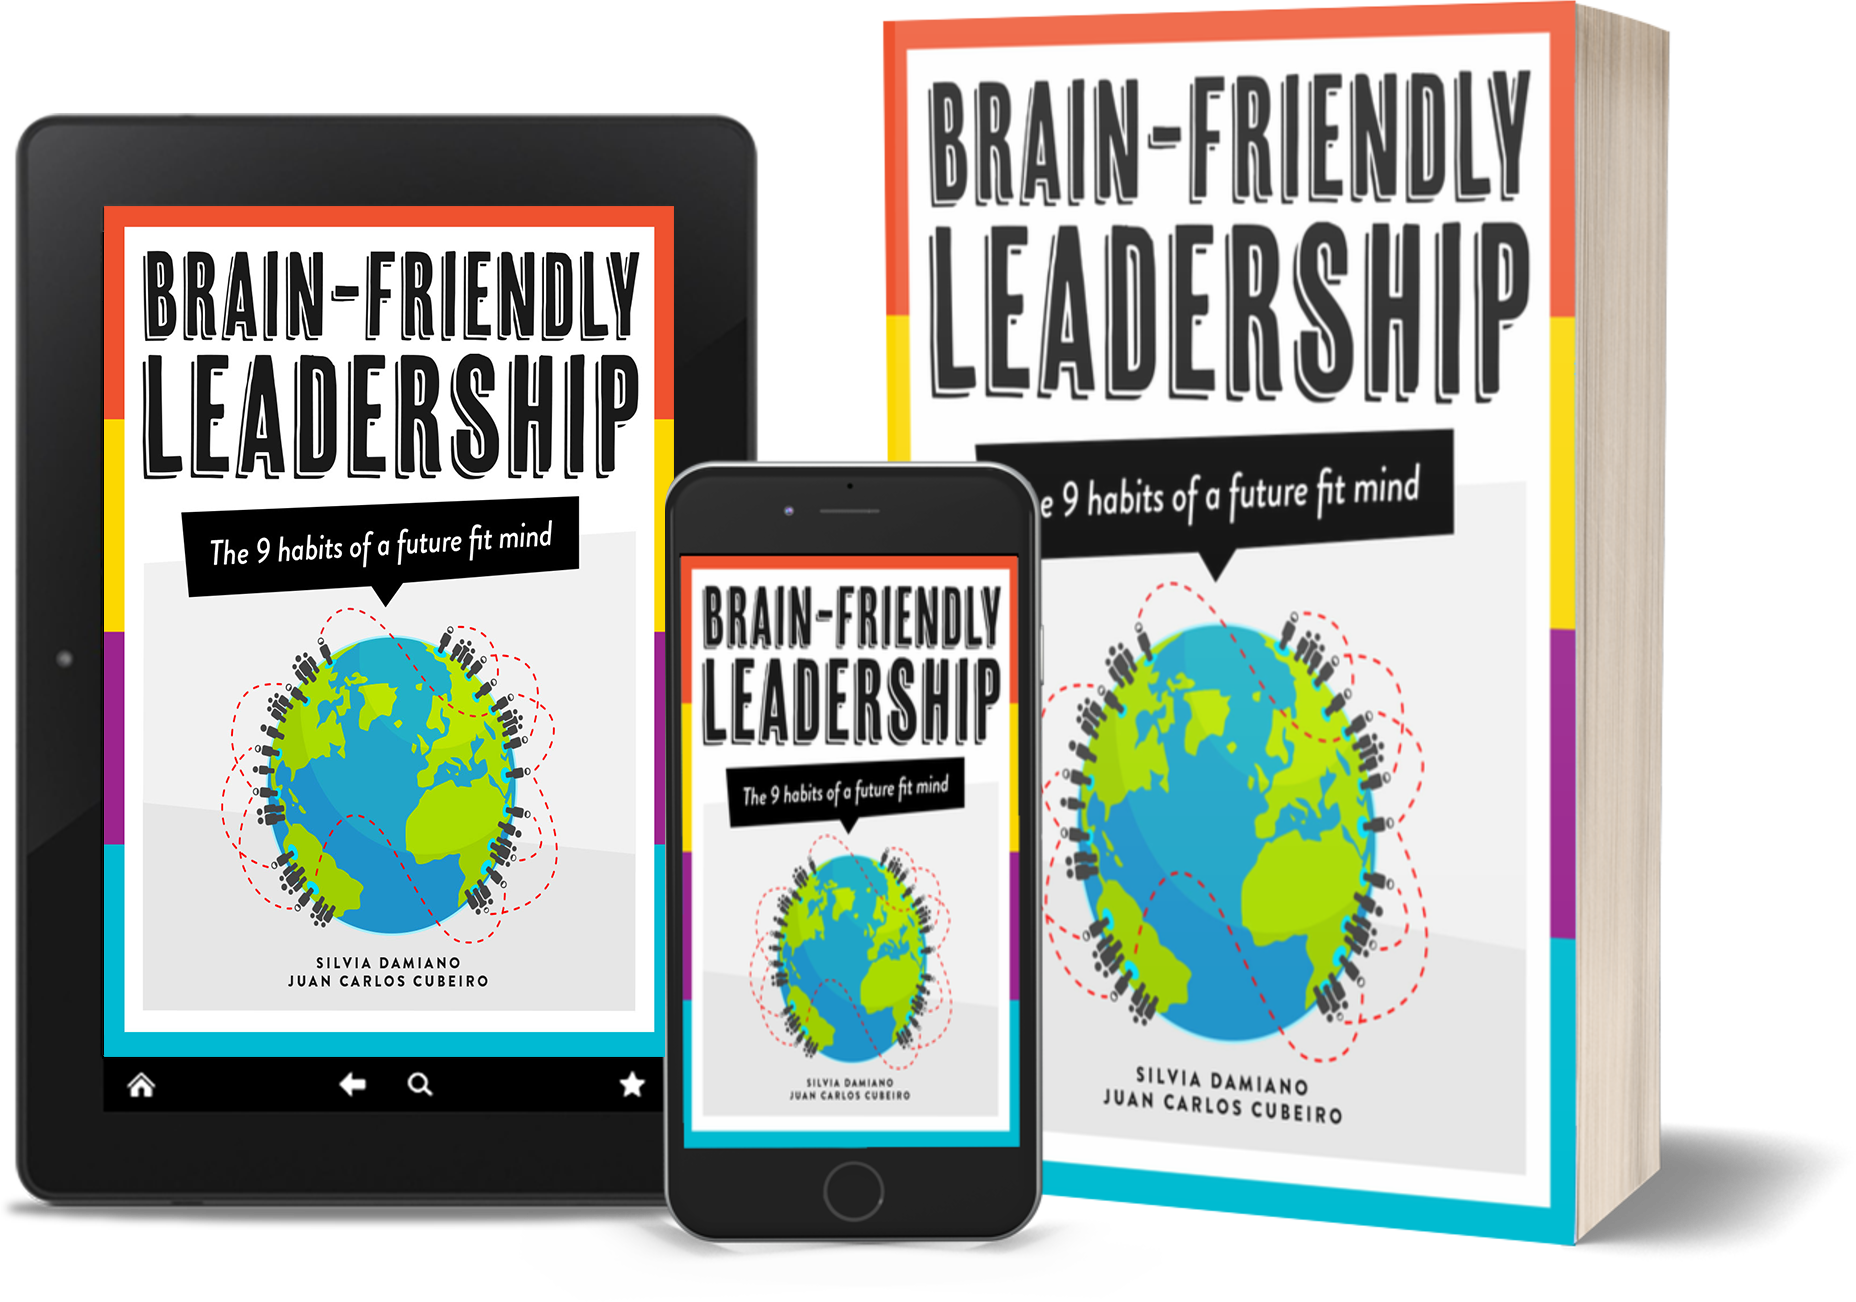 brain-friendly-leadership-book-mockup